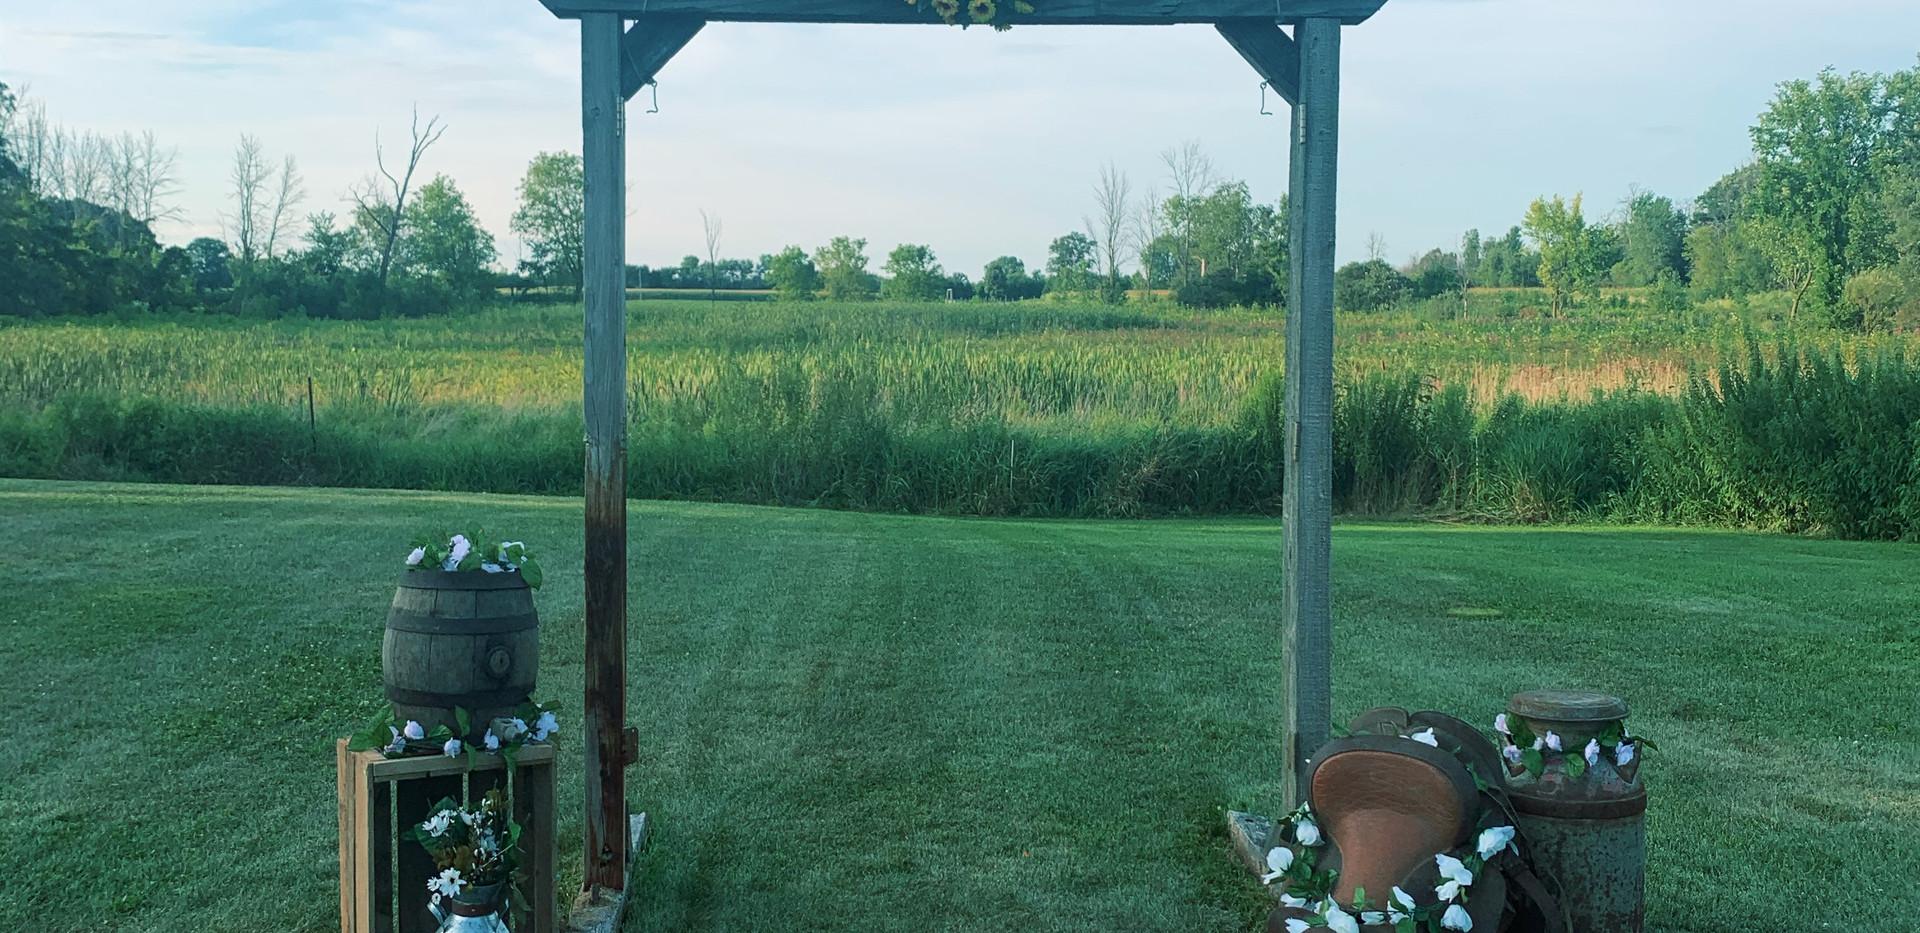 Grassy Field Ceremony Spot